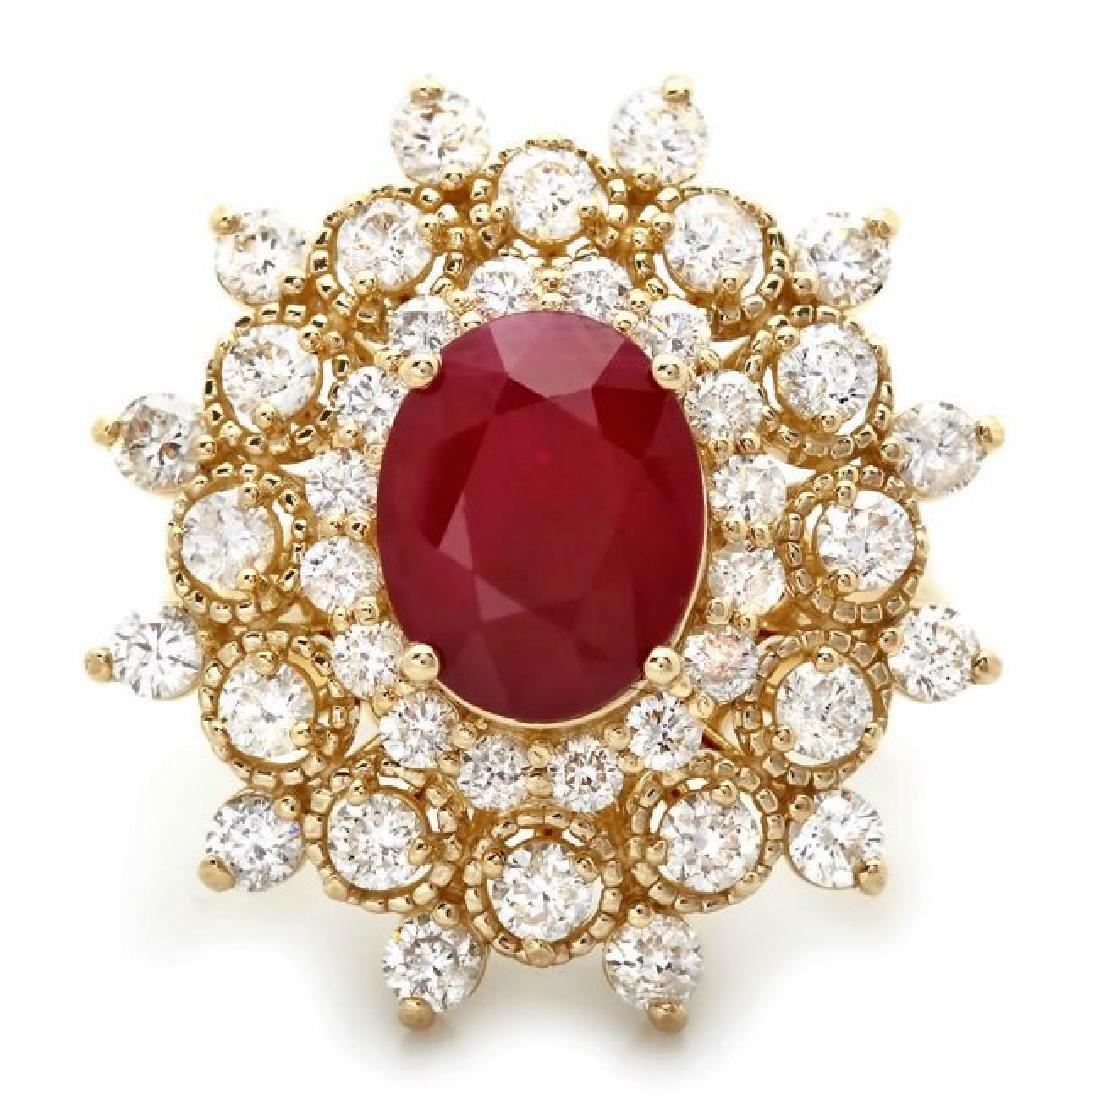 14k Yellow Gold 4.00ct Ruby 2.00ct Diamond Ring - 2